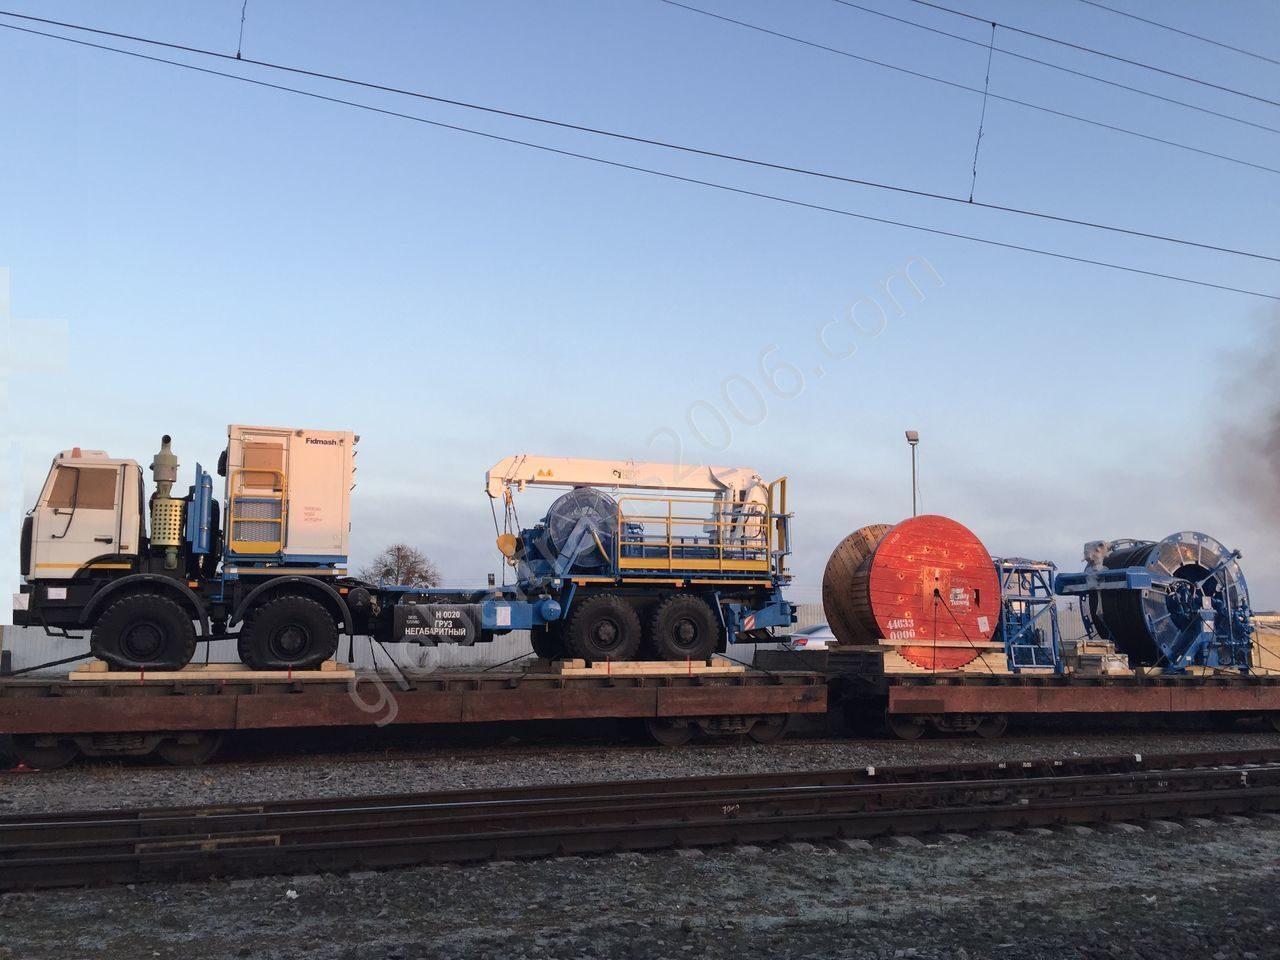 global-trans-vorkuta-perevozka-avtomobiley-do-sosnogorska